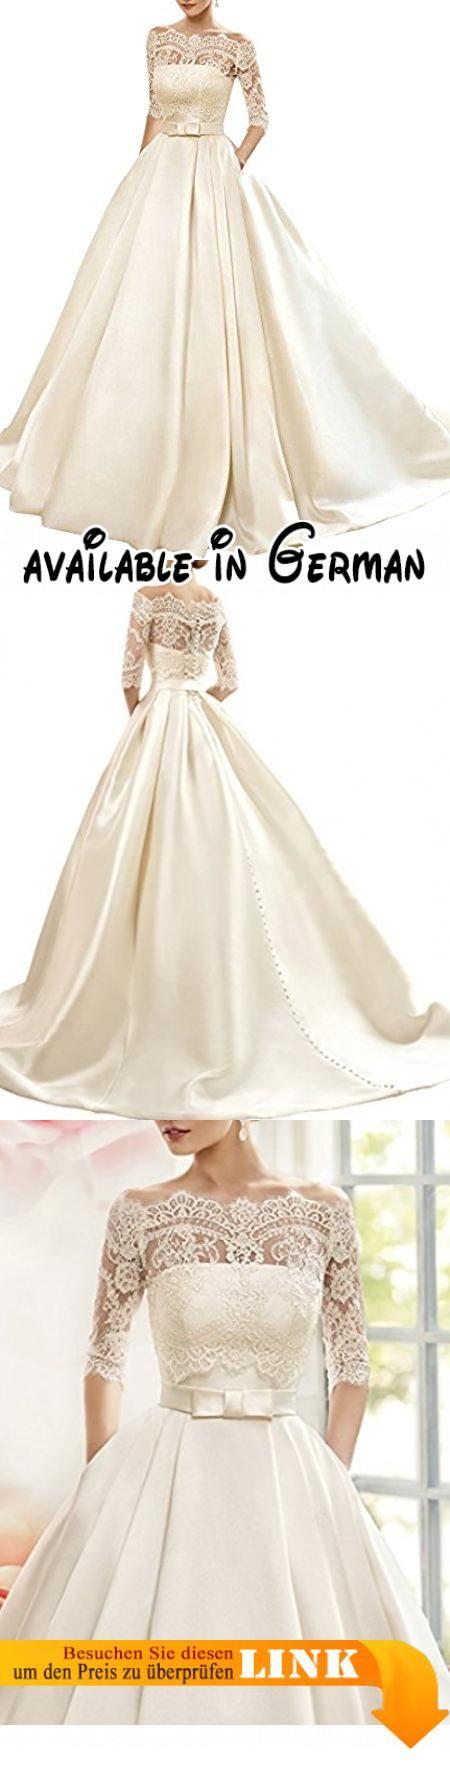 ccc593f972faf5 Changjie Damen Bateau 3/4-Arm Brautkleider Hochzeitskleider Prinzessin  Hochzeitskleider A-linie Langarm Kleider. brautkleider hochzeitskl…